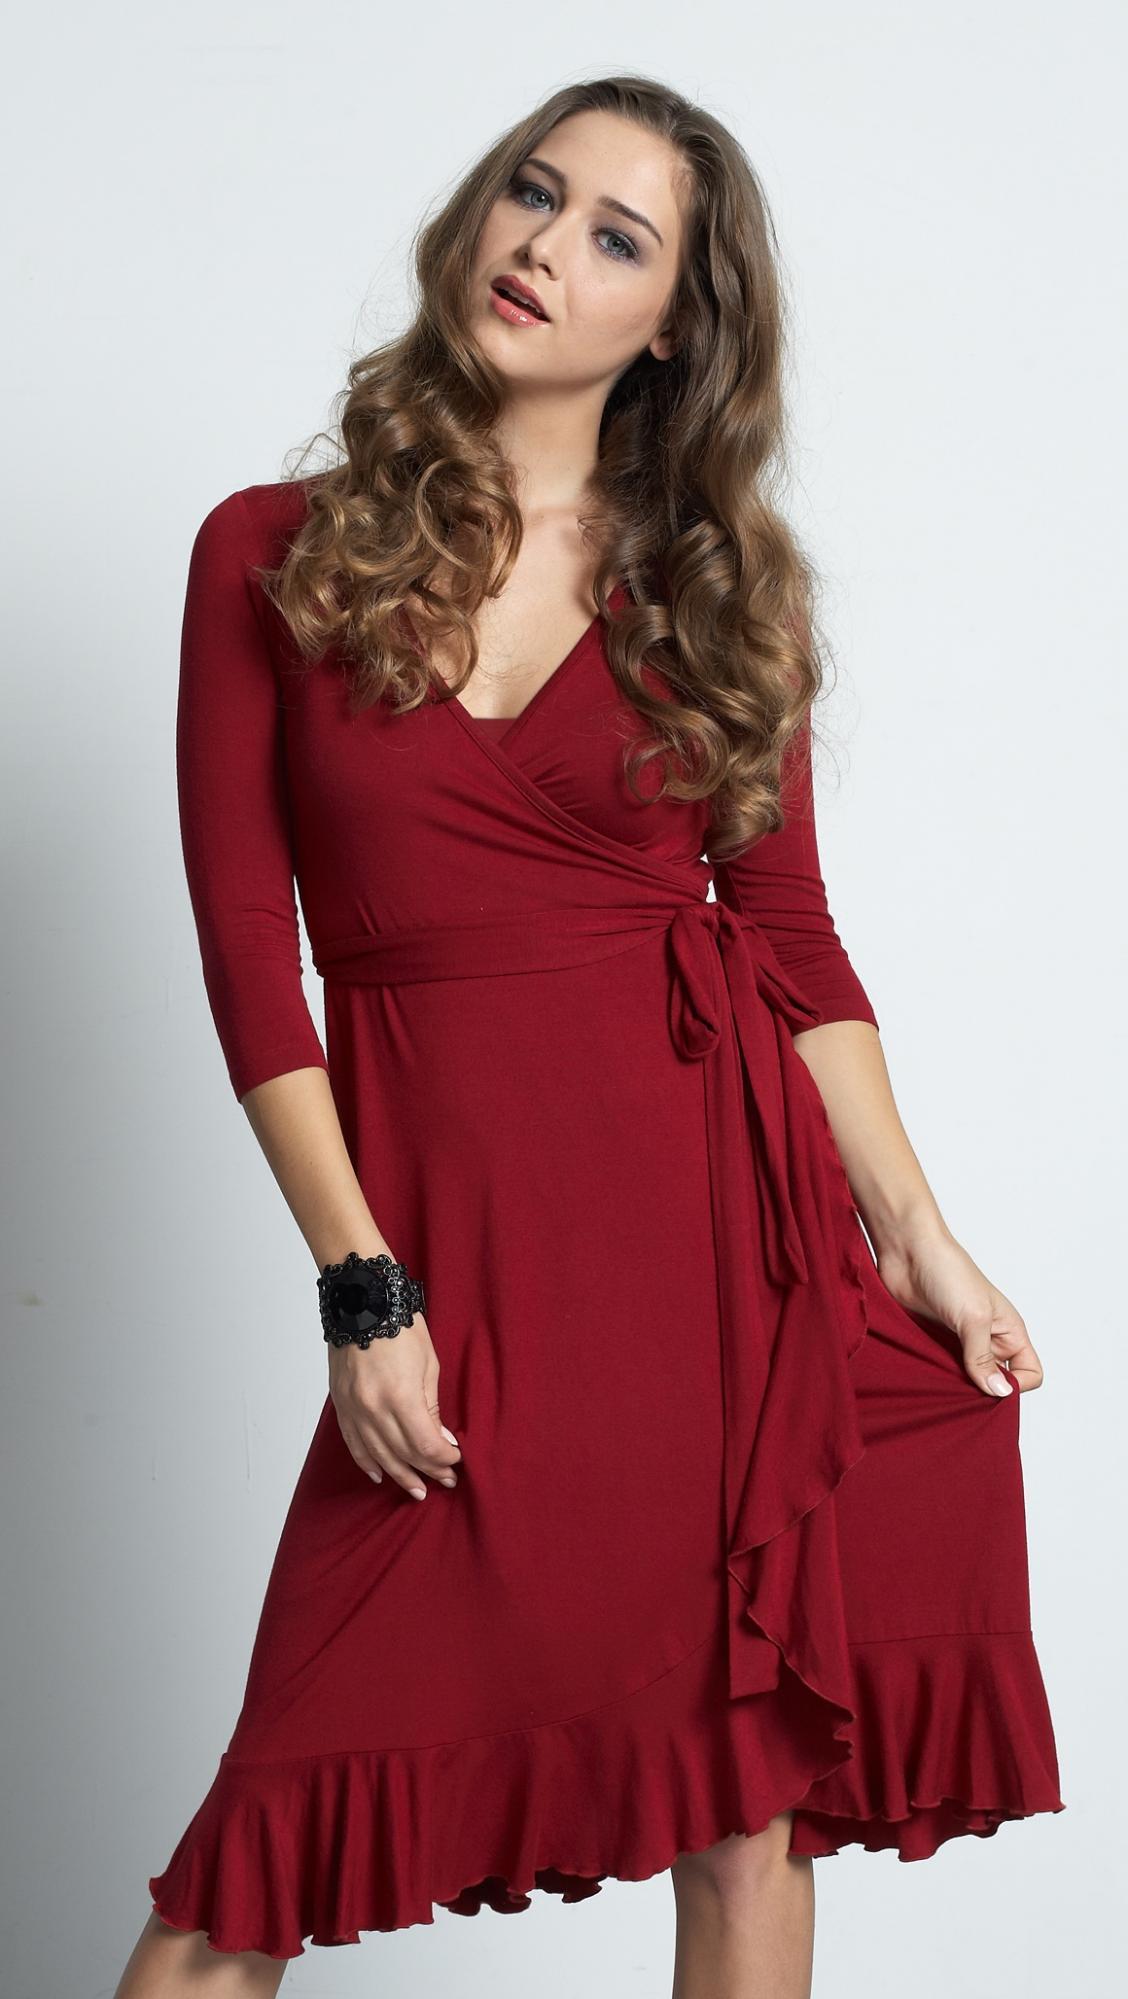 mother-en-vogue-flamenco-nursing-dress-red.jpg